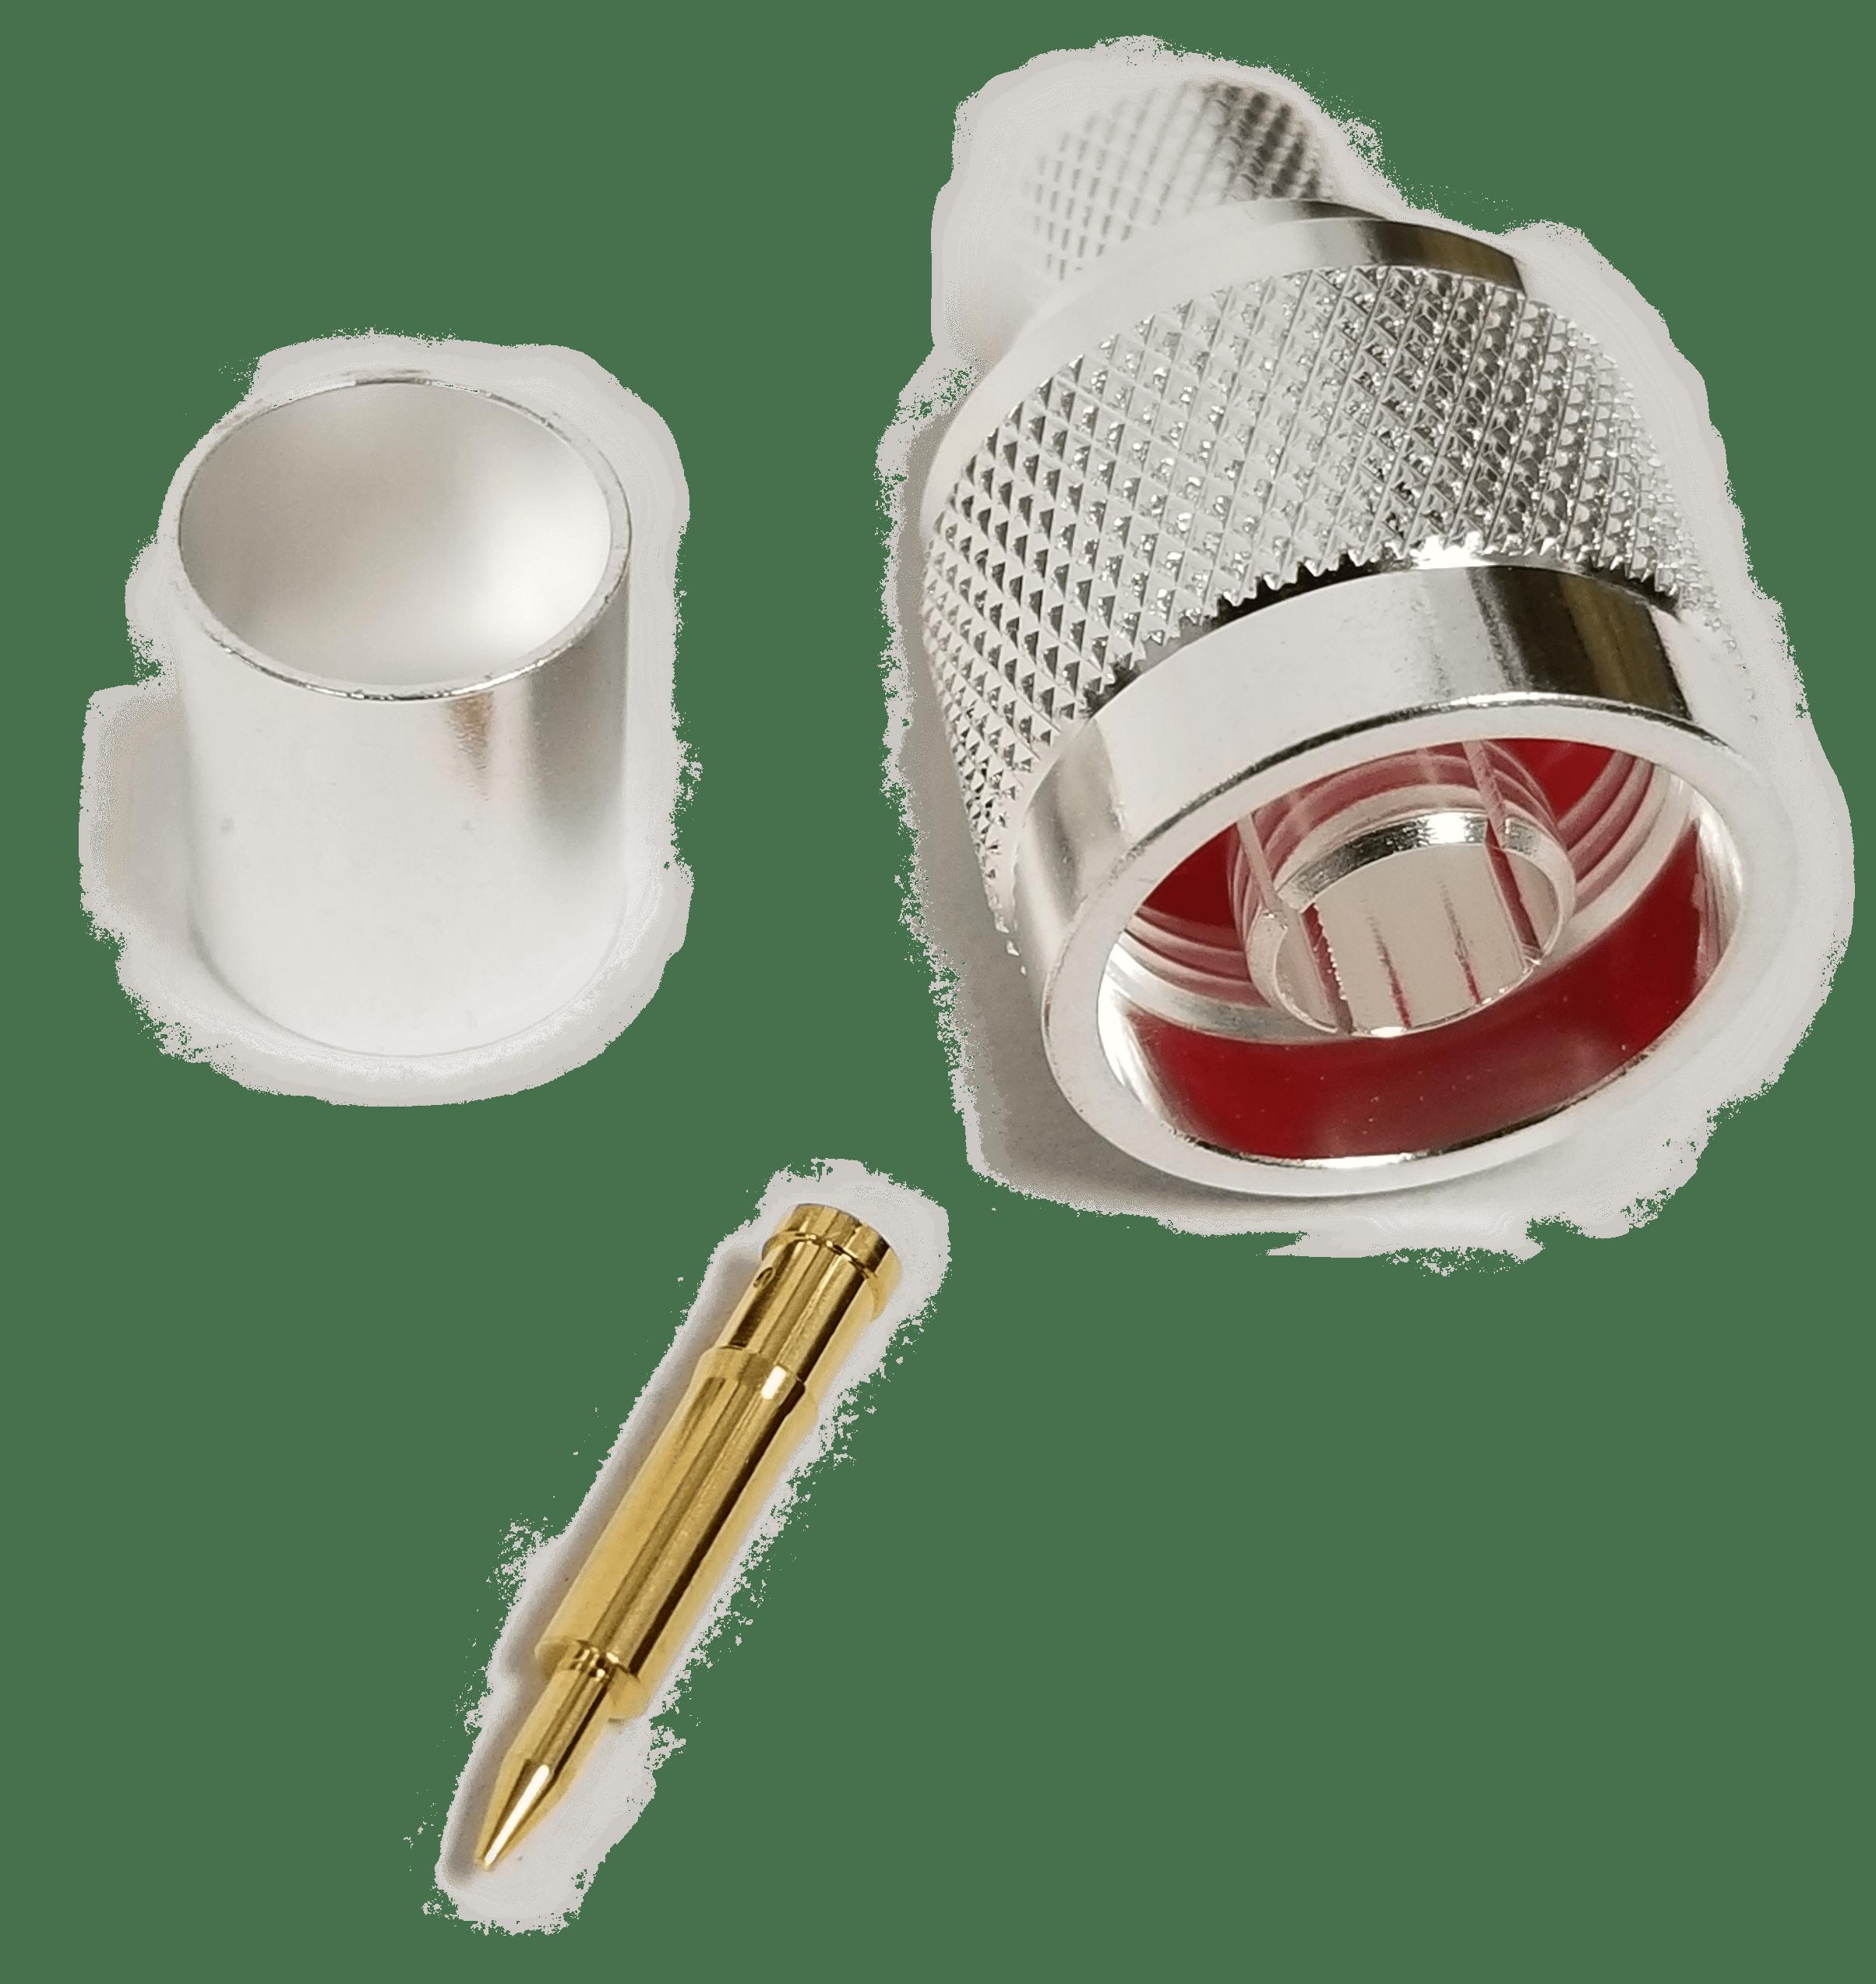 N-01 - ProComm N Male Connector Style For Rg8U Coax